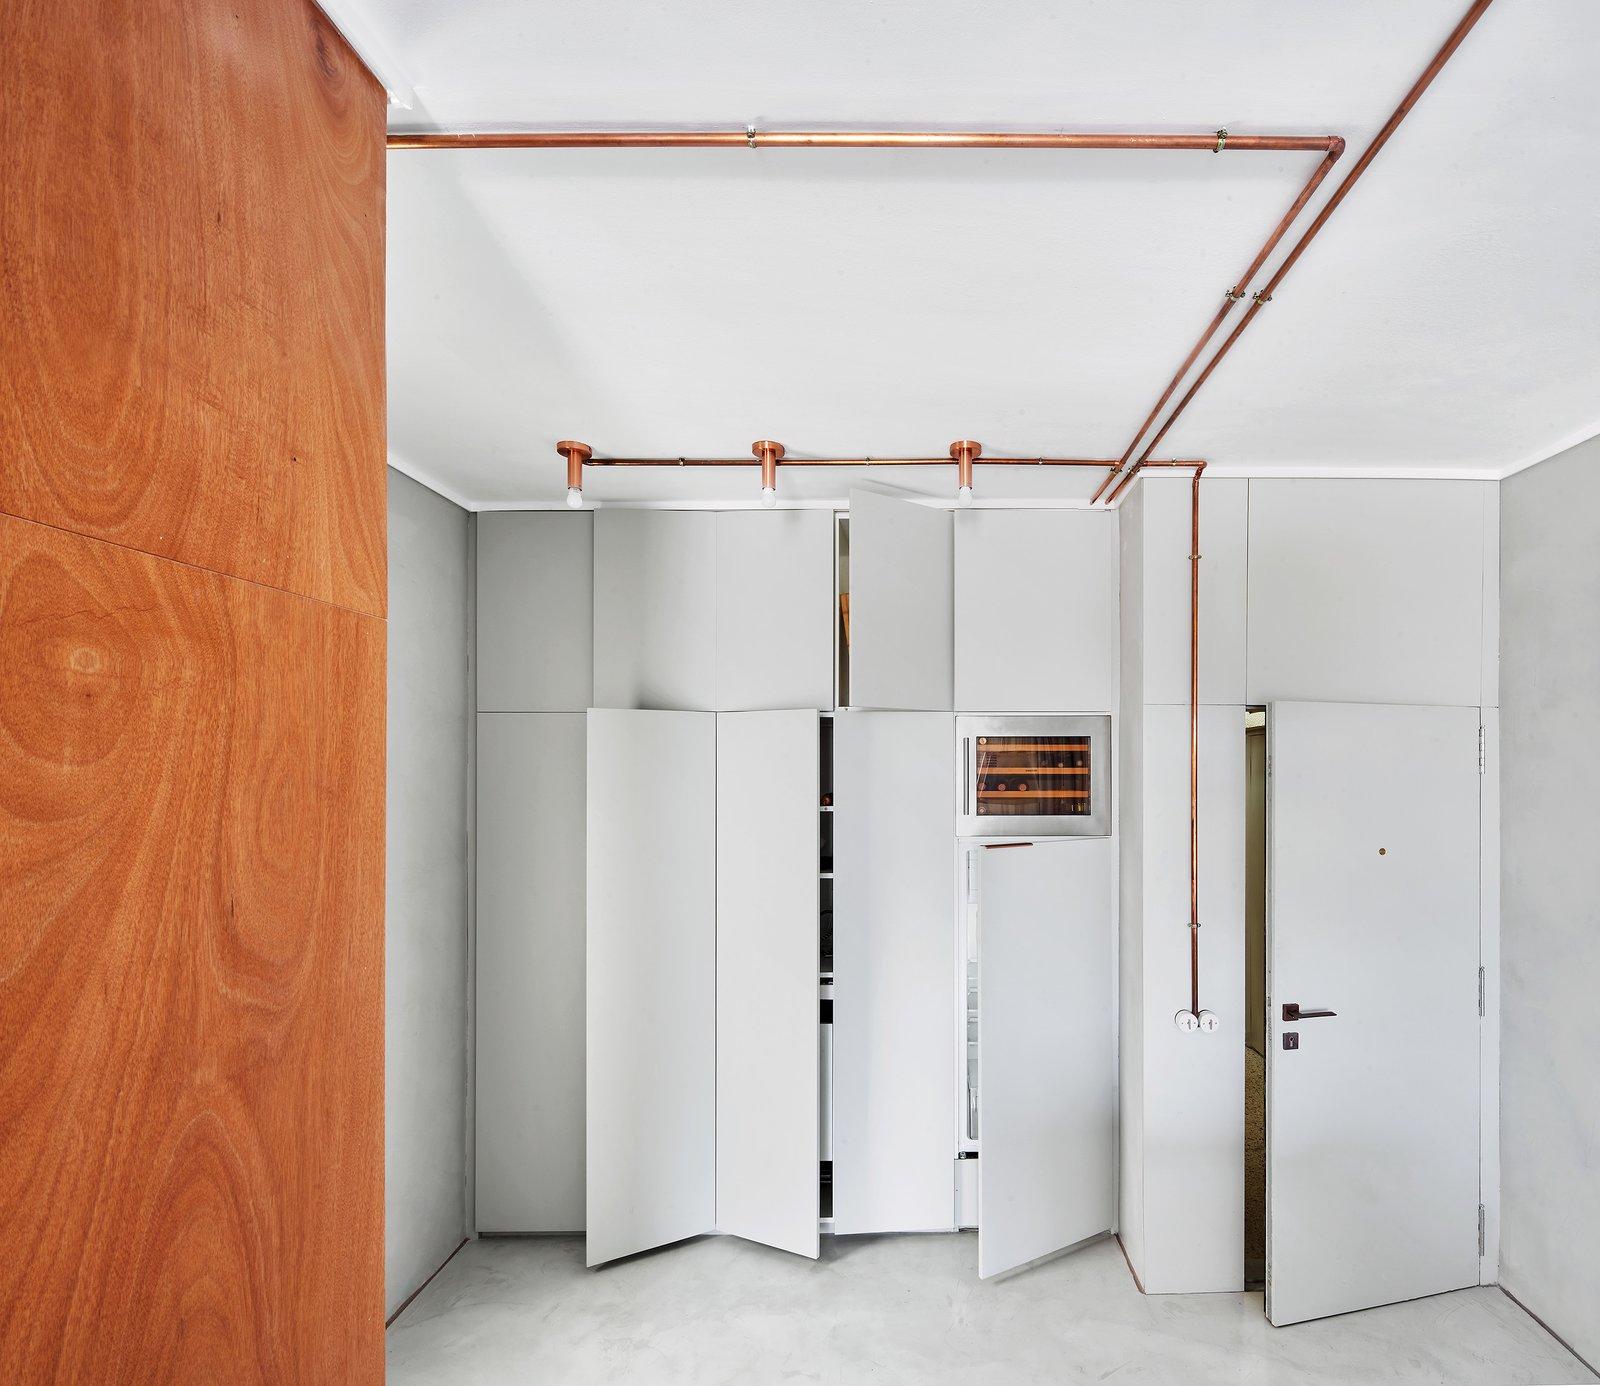 Kitchen, Wood, Refrigerator, Concrete, Concrete, Wood, Ceiling, and Wine Cooler Entrance along with built in closets, fridge & vinotecca  Best Kitchen Concrete Refrigerator Wood Photos from The Marina Apartment